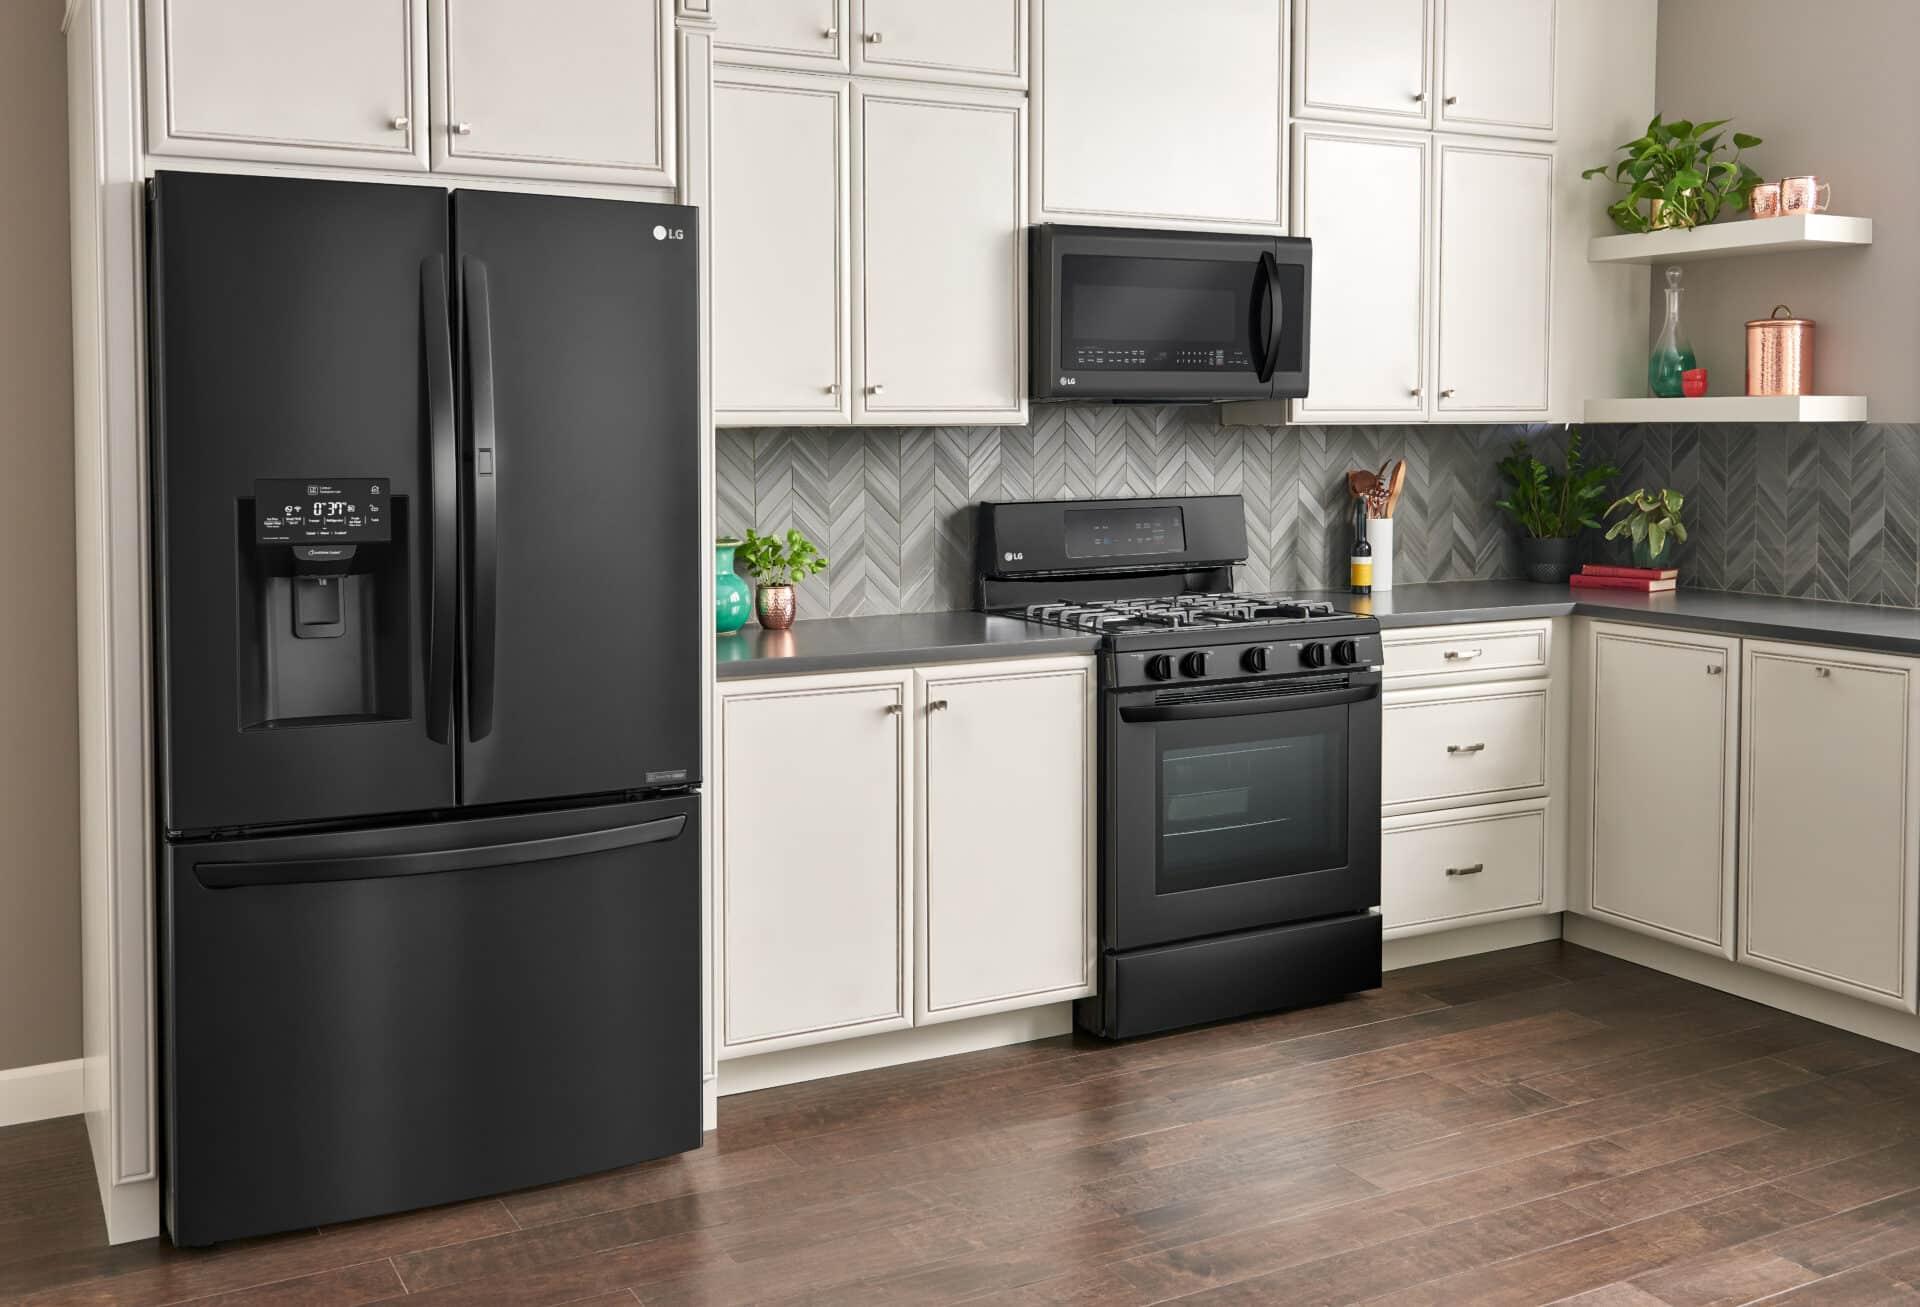 LG Matte Black Kitchen - The Sleek, Chic Kitchen Space You ...